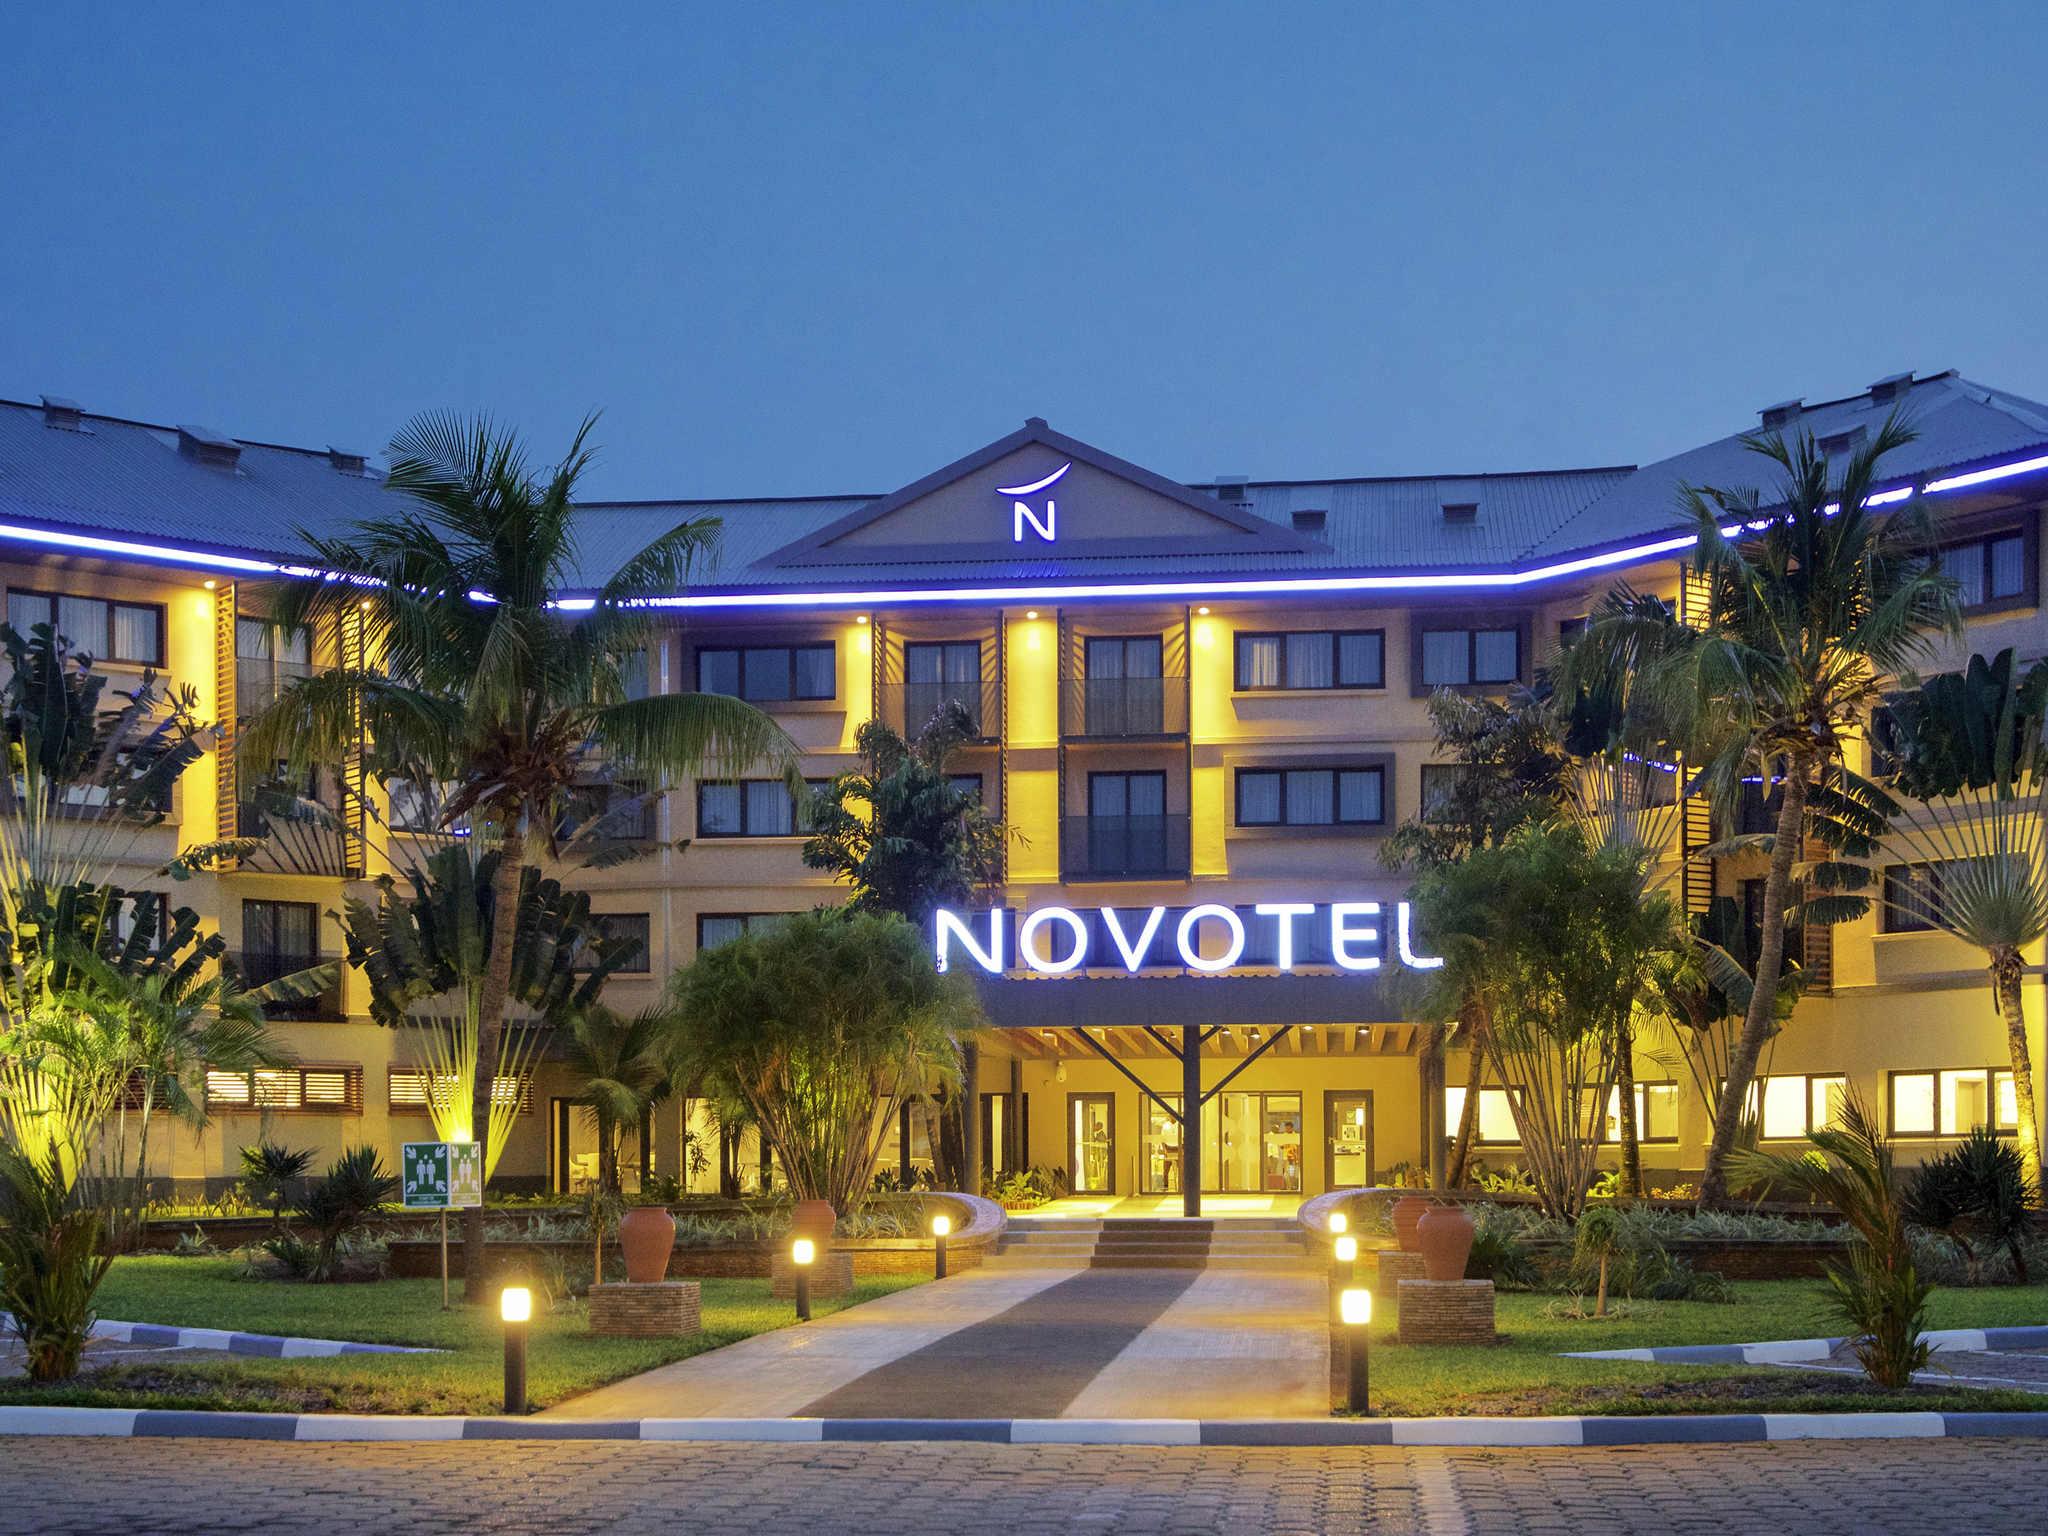 فندق - Novotel Cotonou Orisha - Fermé pour rénovation